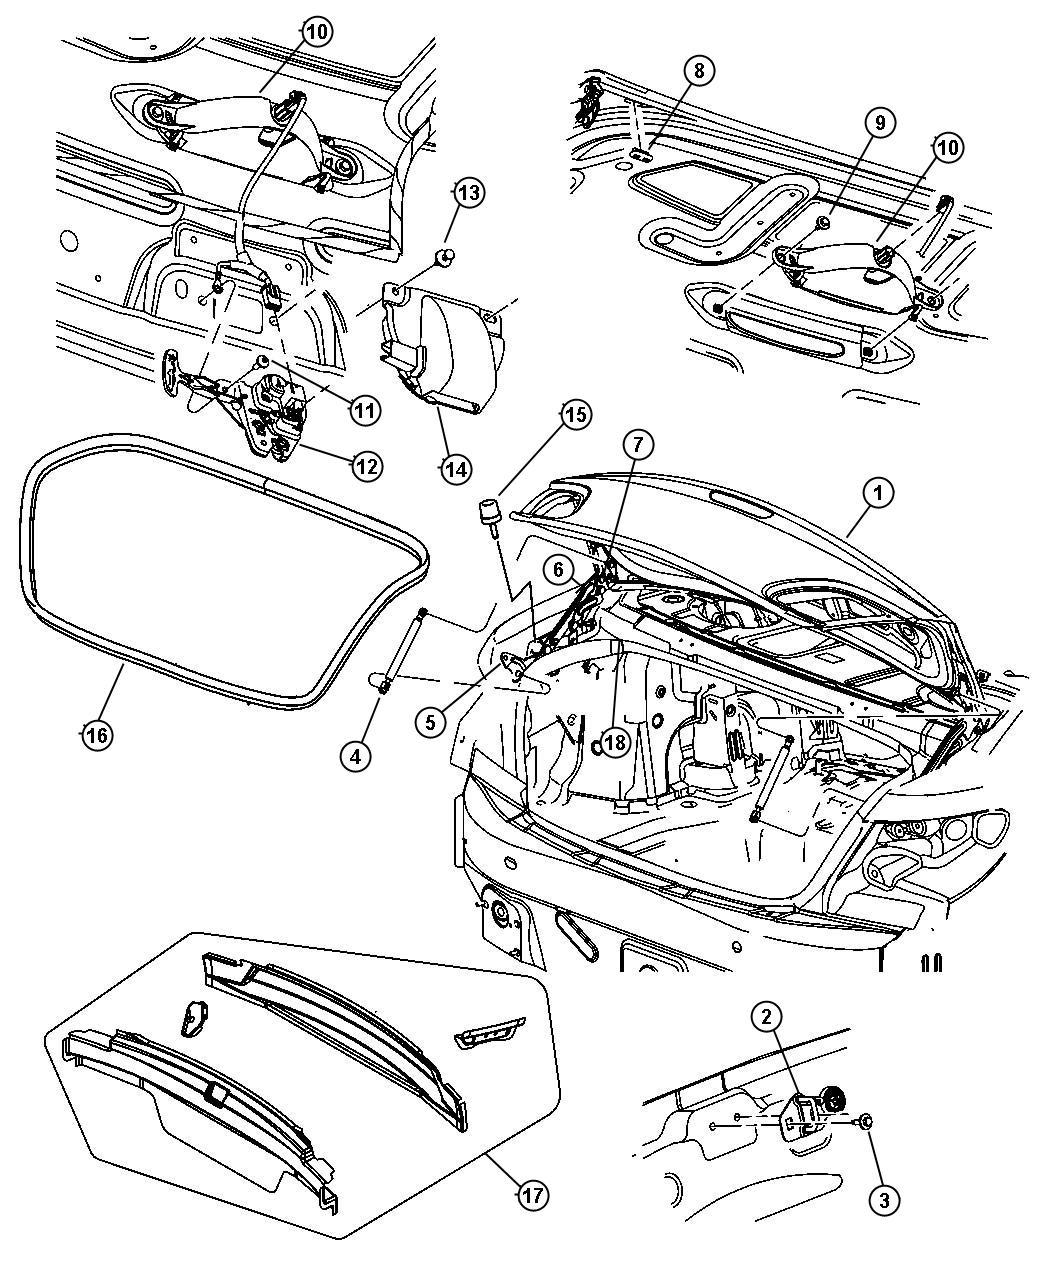 2007 Chrysler Sebring 2.4L 4 Cyl DOHC 16V Dual VVT, 4